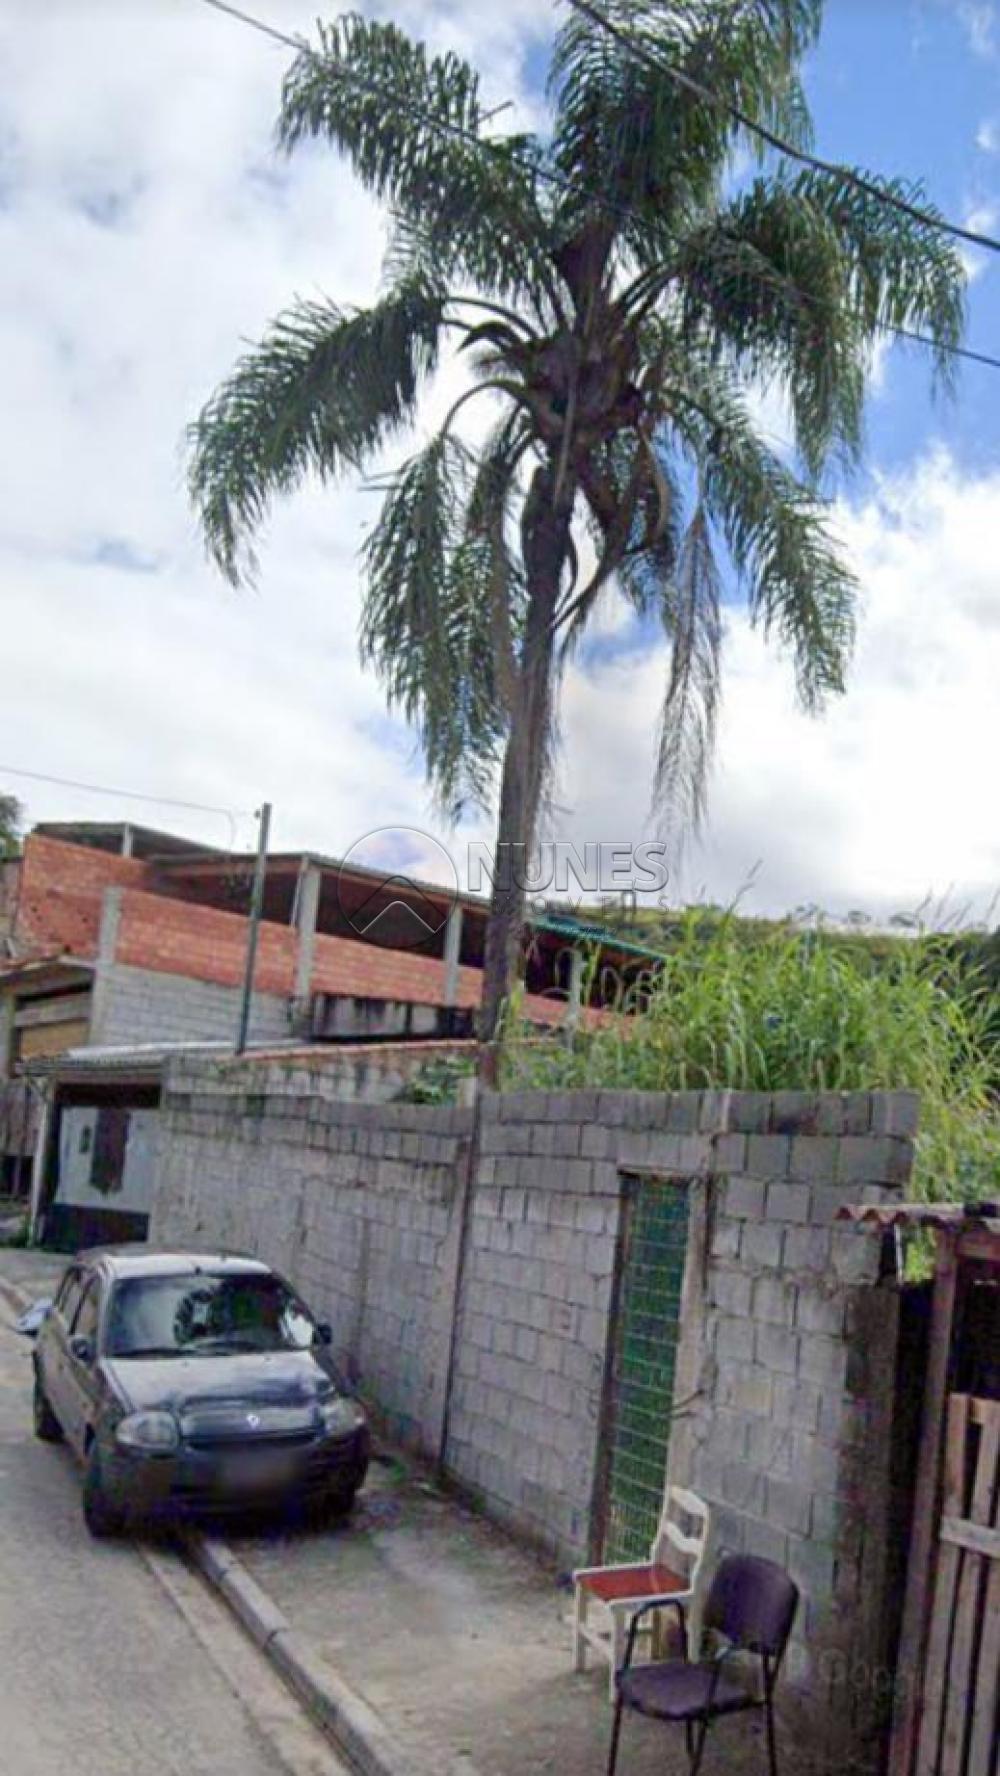 Comprar Terreno / Terreno em Itapevi apenas R$ 450.000,00 - Foto 2